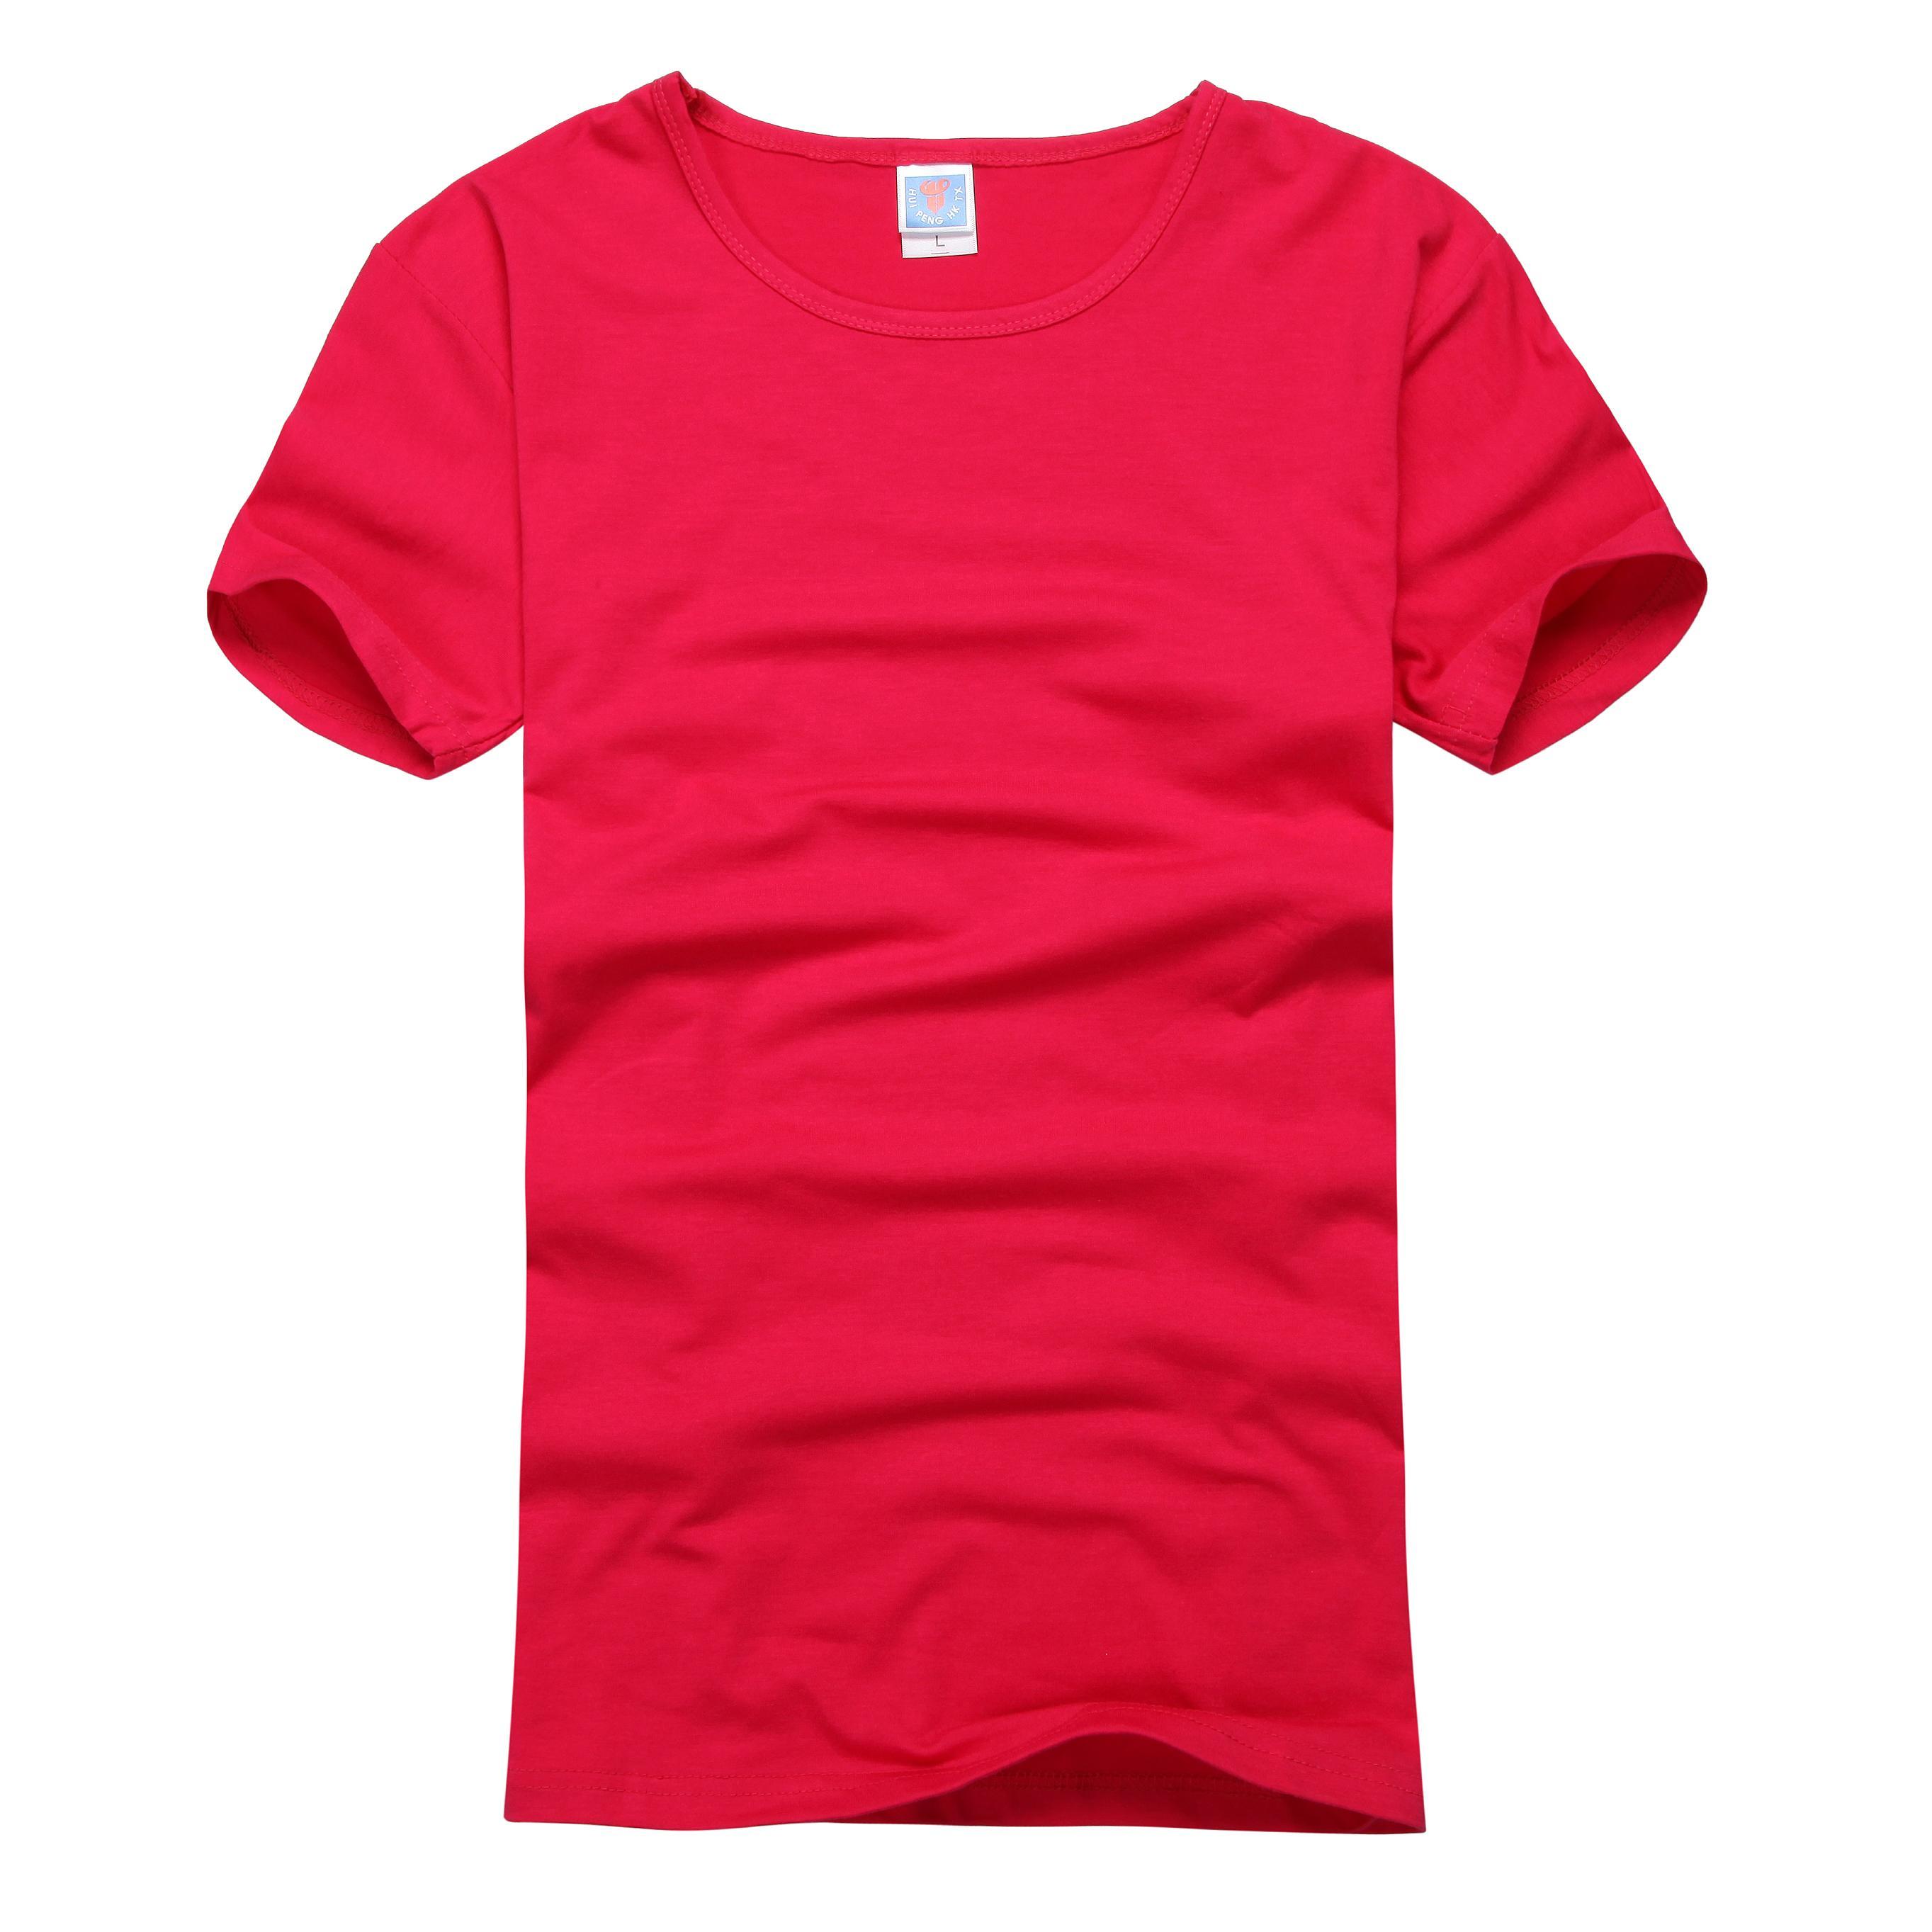 t恤衫有什么要求,要怎么选择材料